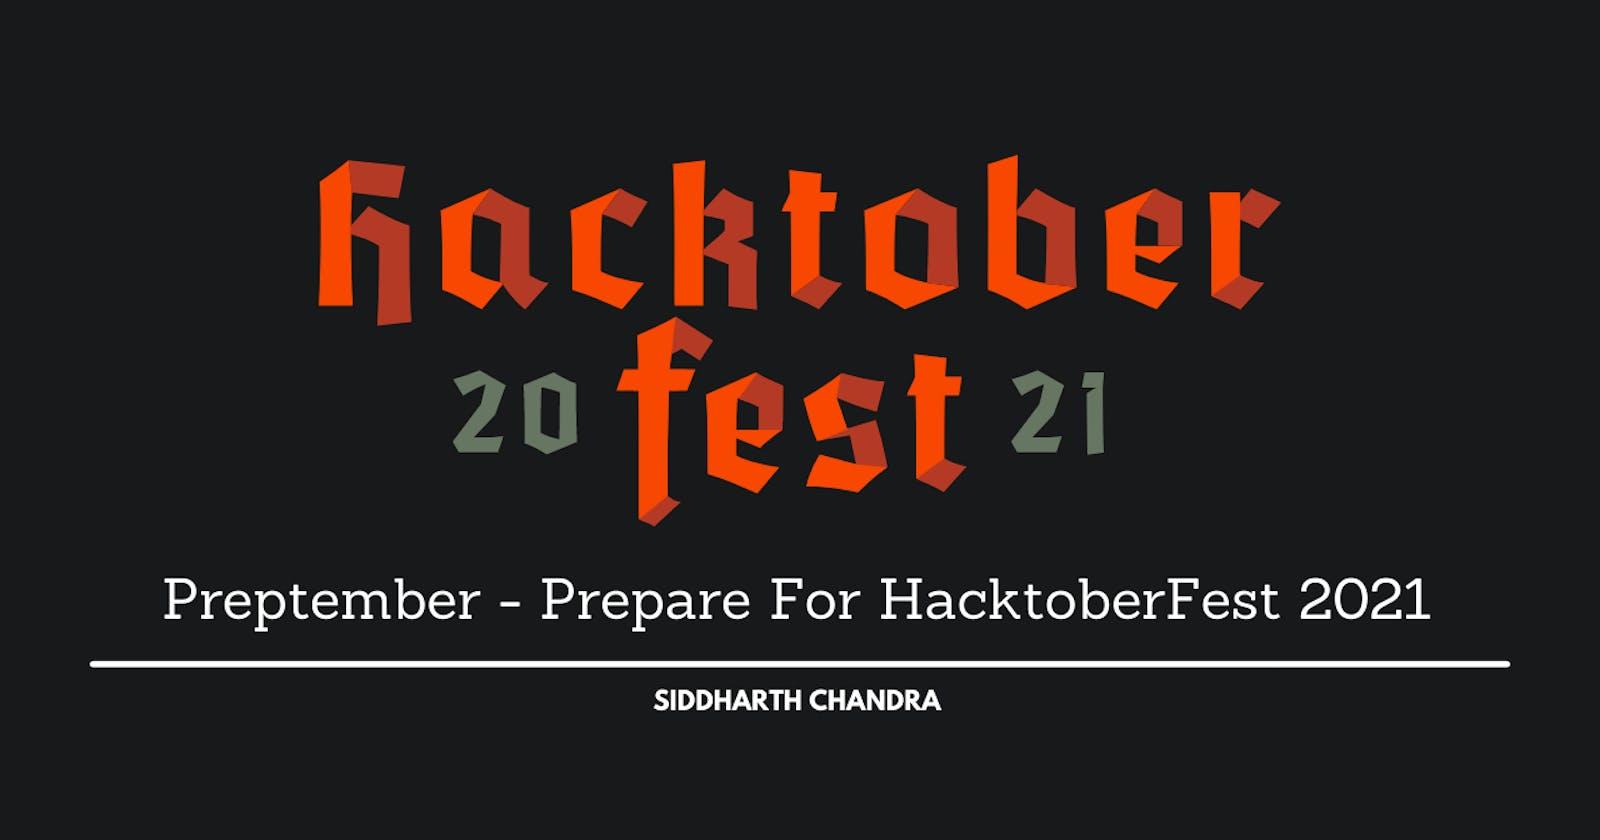 Preptember - Prepare For HacktoberFest 2021